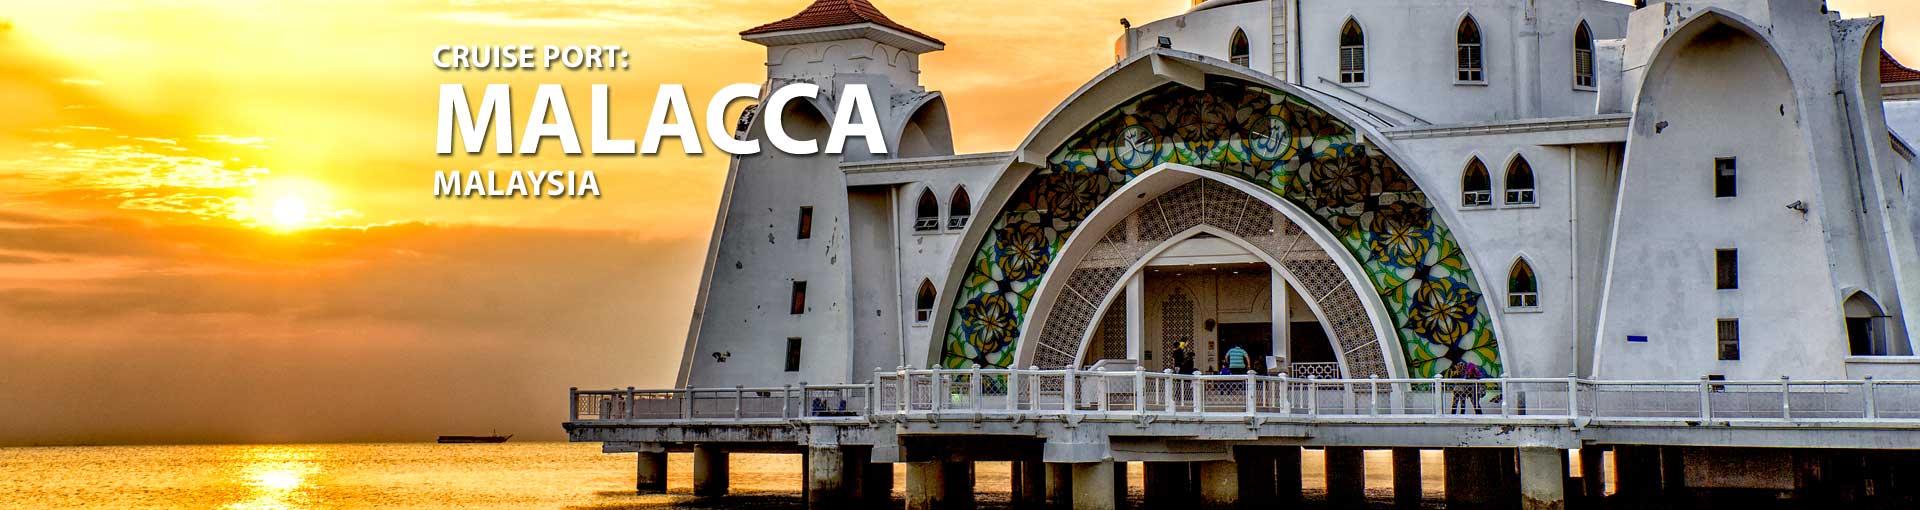 Cruises to Malacca, Malaysia